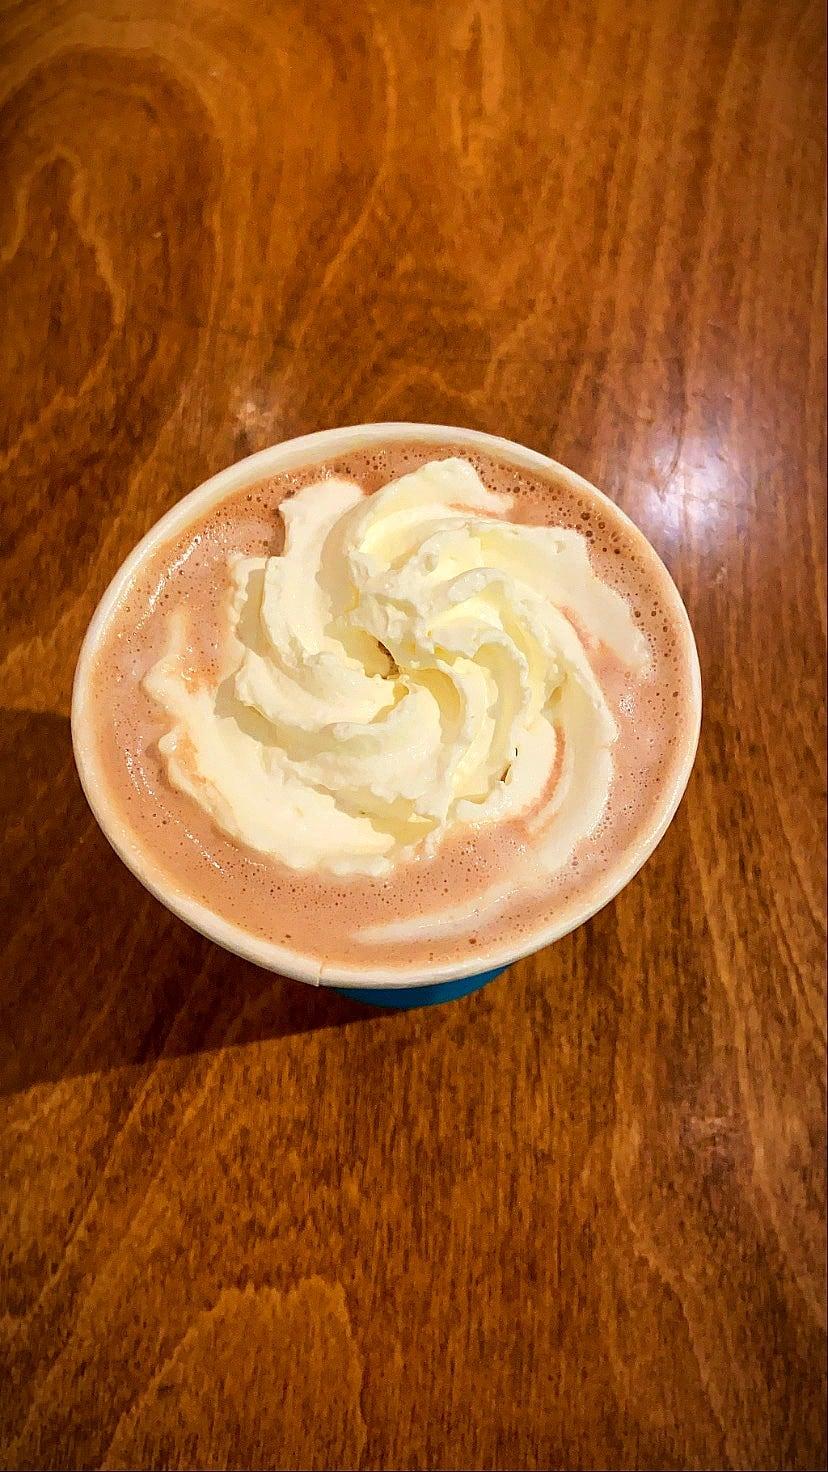 hot cocoa from wild joe's in bozeman